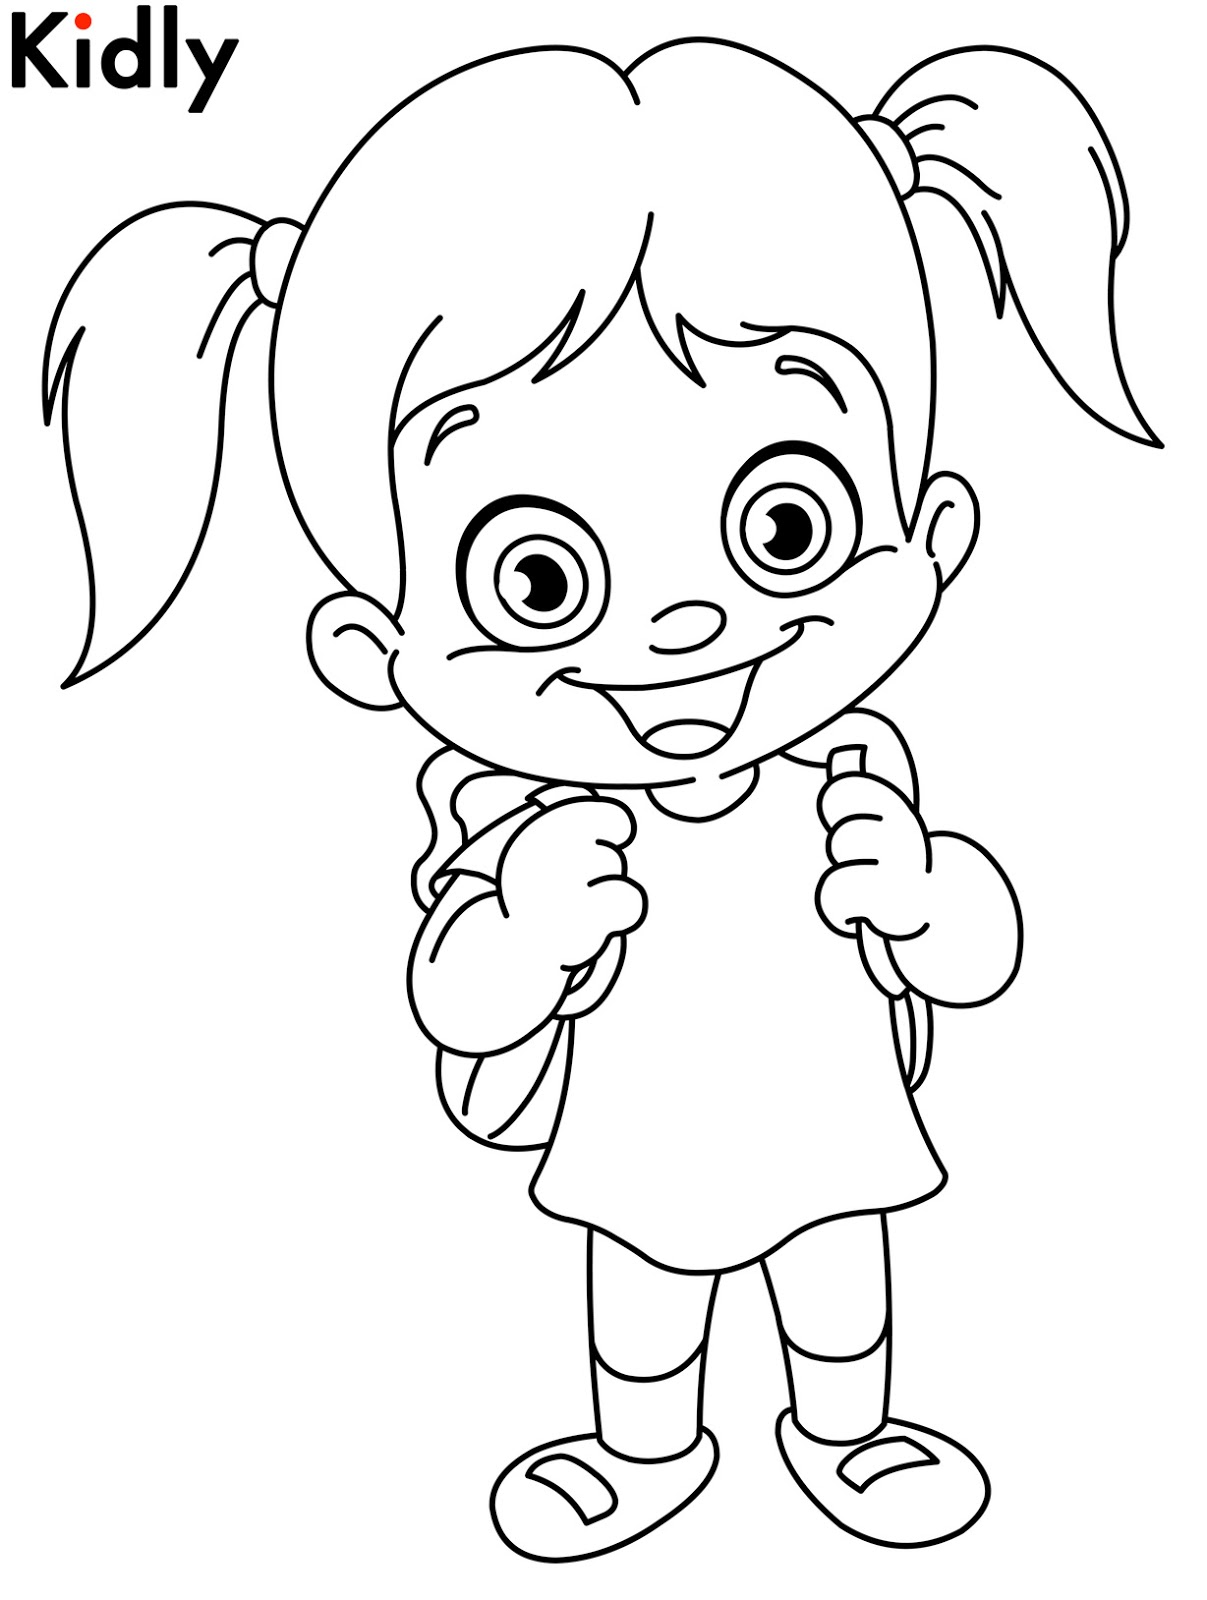 Mewarnai Gambar Gadis Kecil